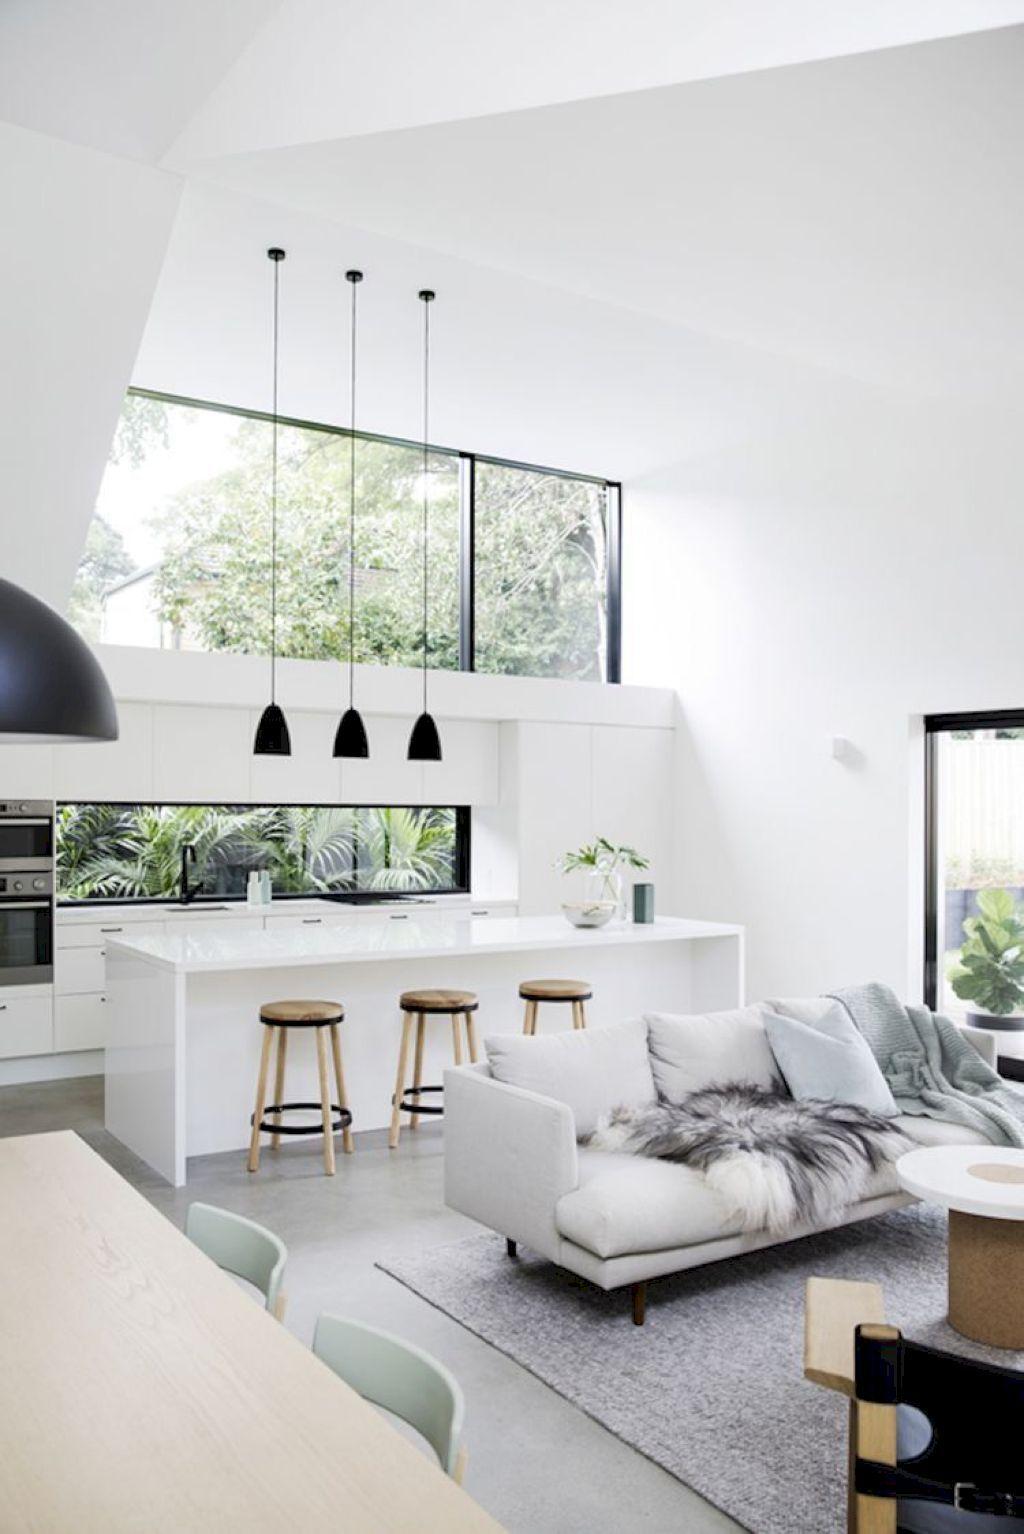 Minimalist home kitchen woods colorful minimalist home chandeliers minimalist kitchen set cabinets minimalist bedroom storage tips